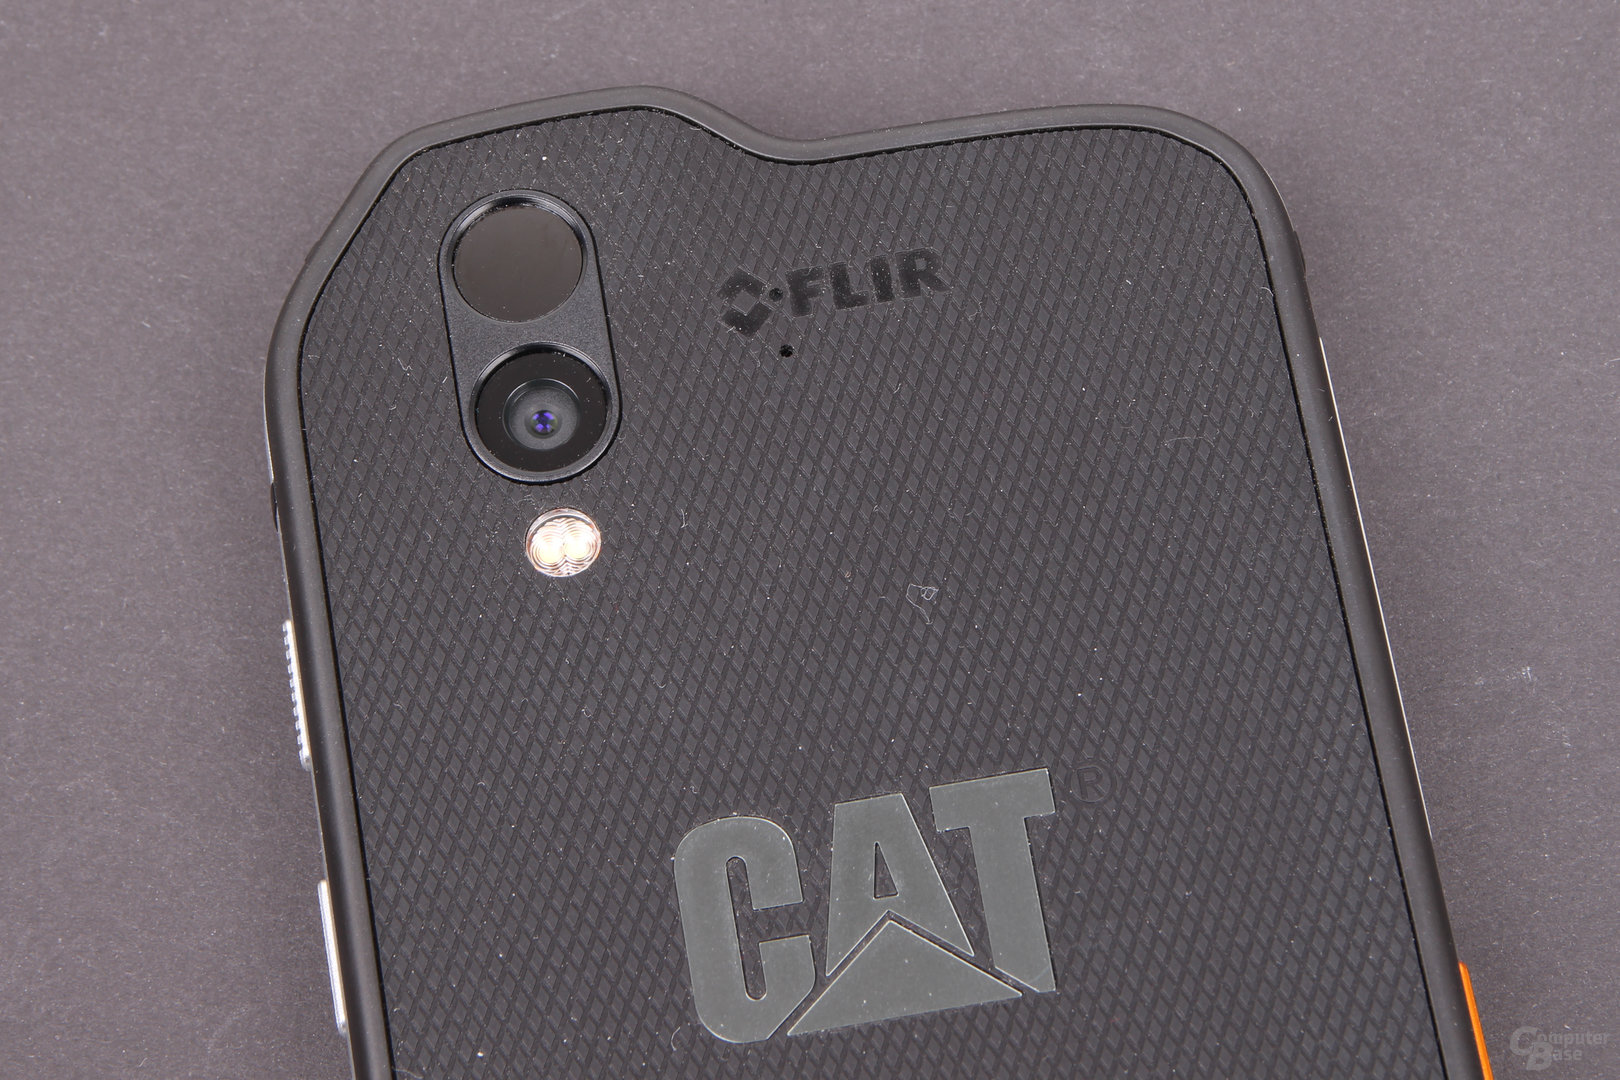 Cat S61 – Kamera und Wärmebildkamera von Flir